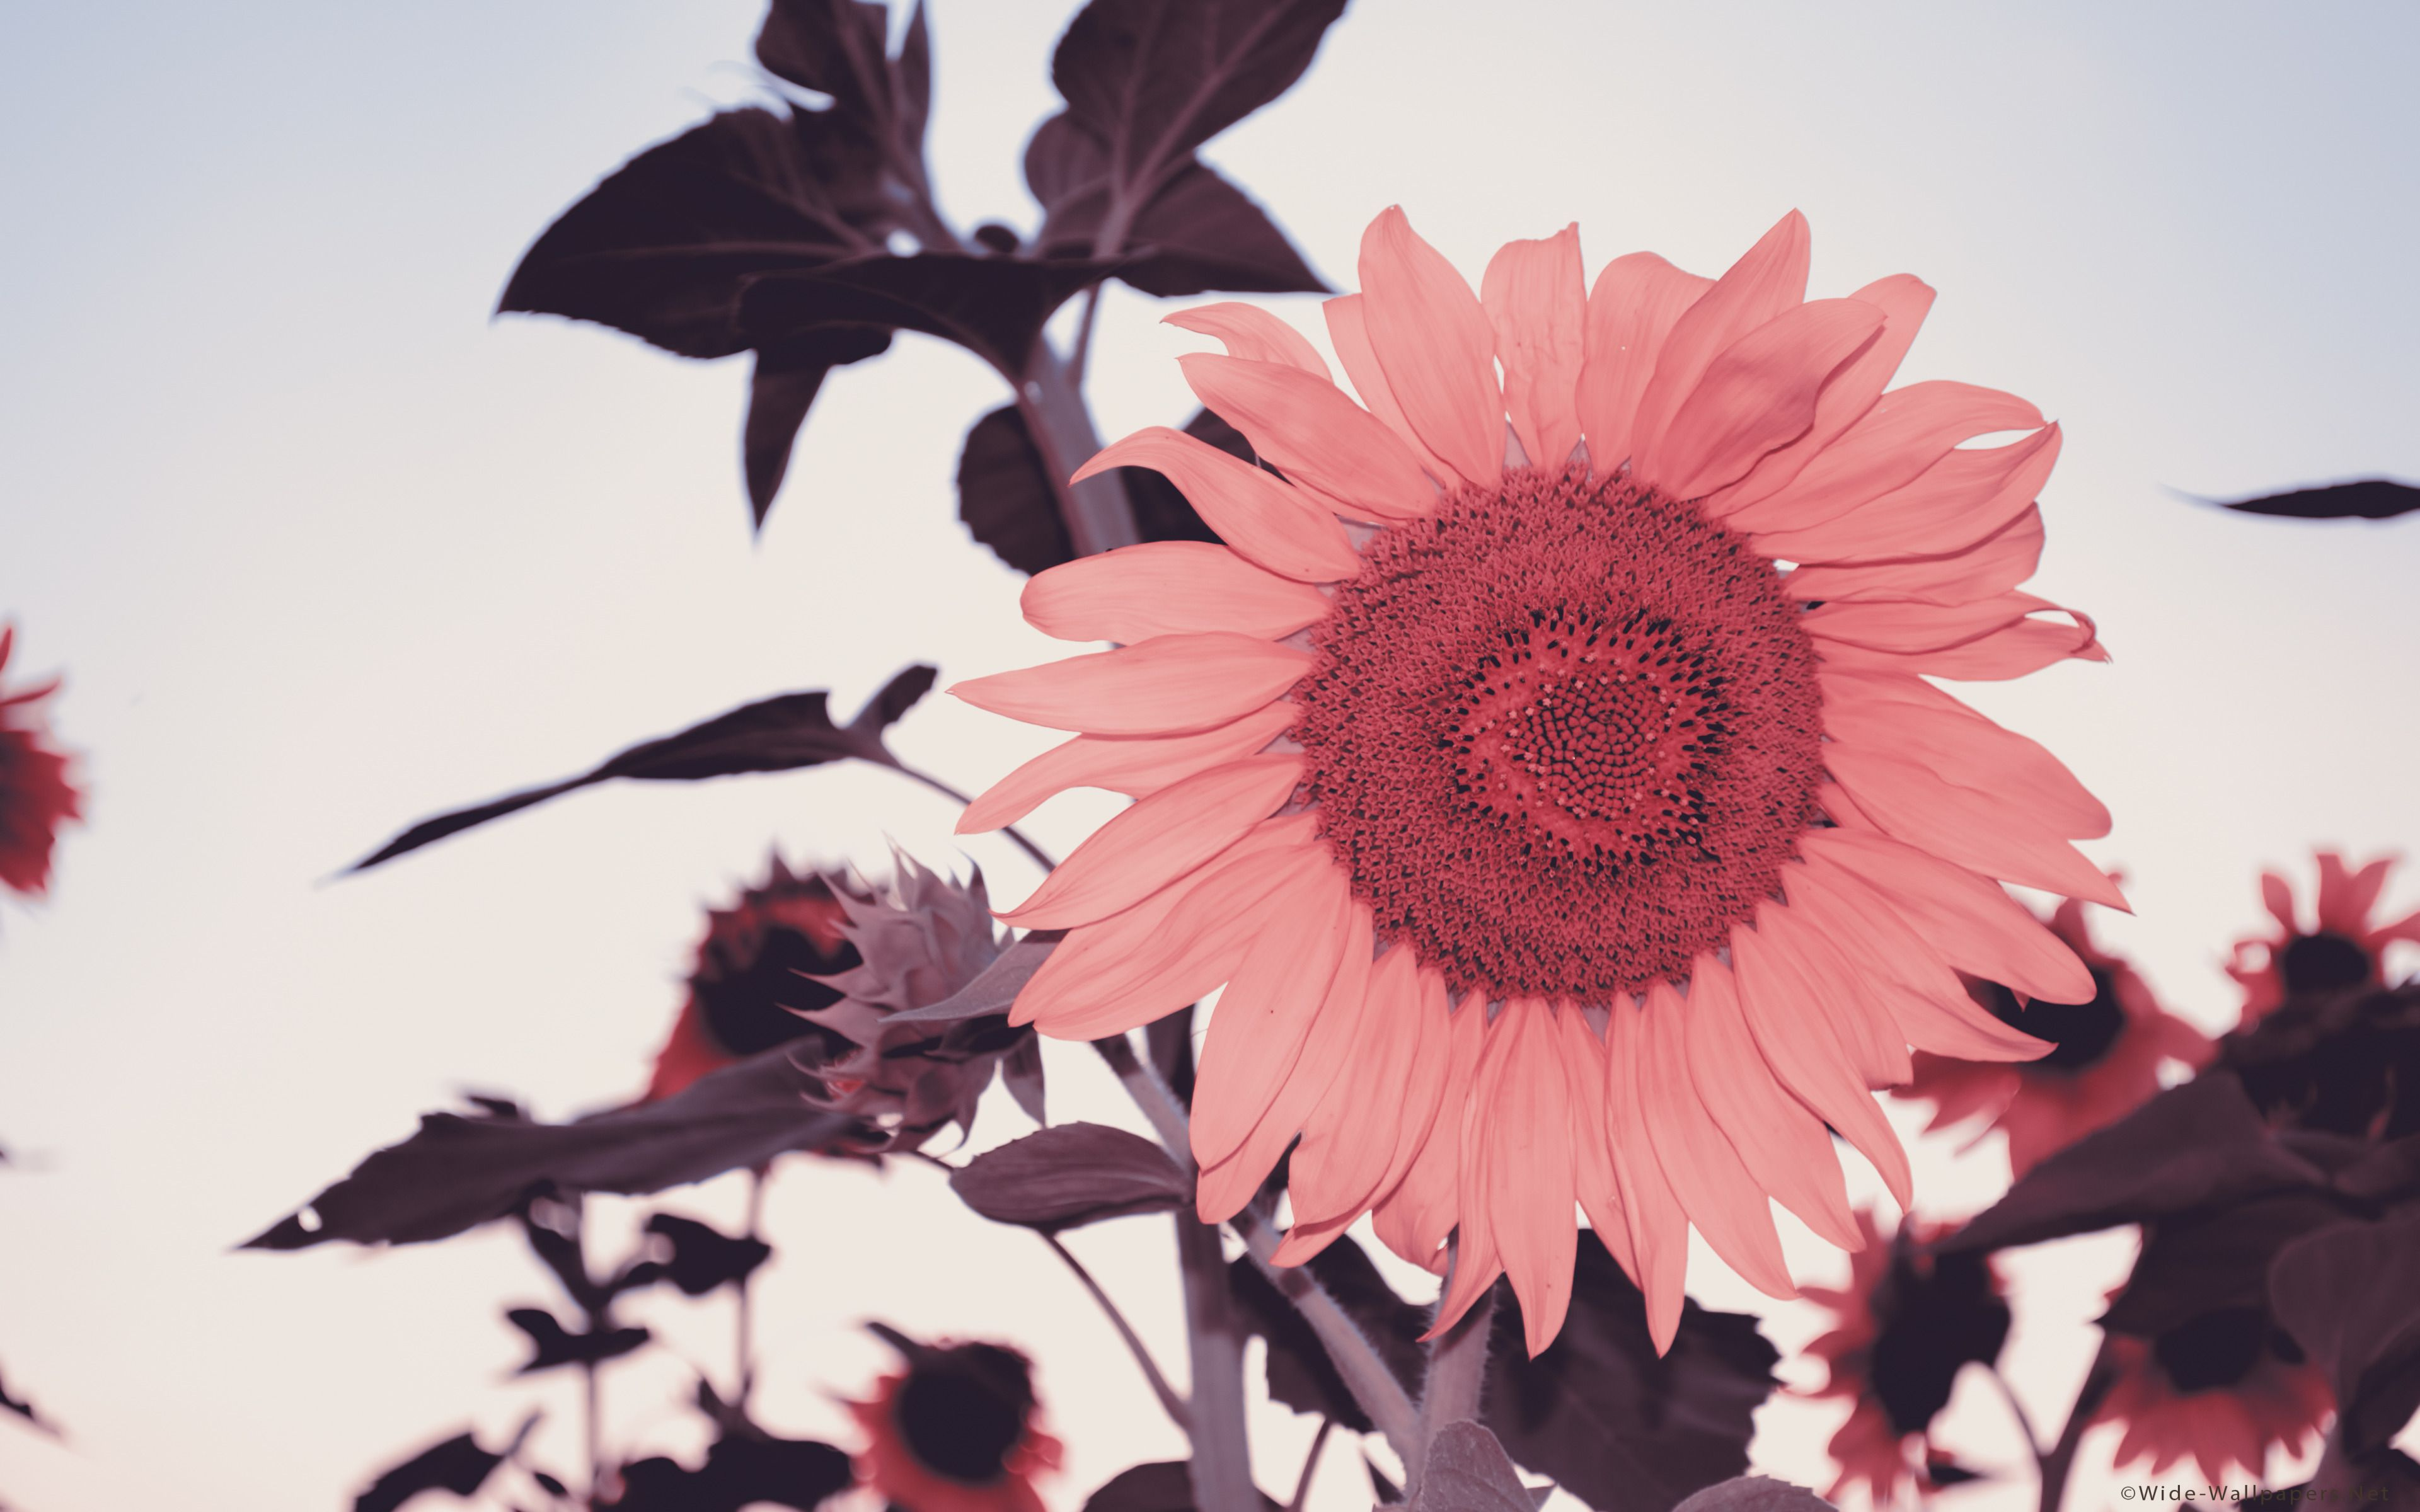 Pink Sunflower Wallpapers Top Free Pink Sunflower Backgrounds Wallpaperaccess